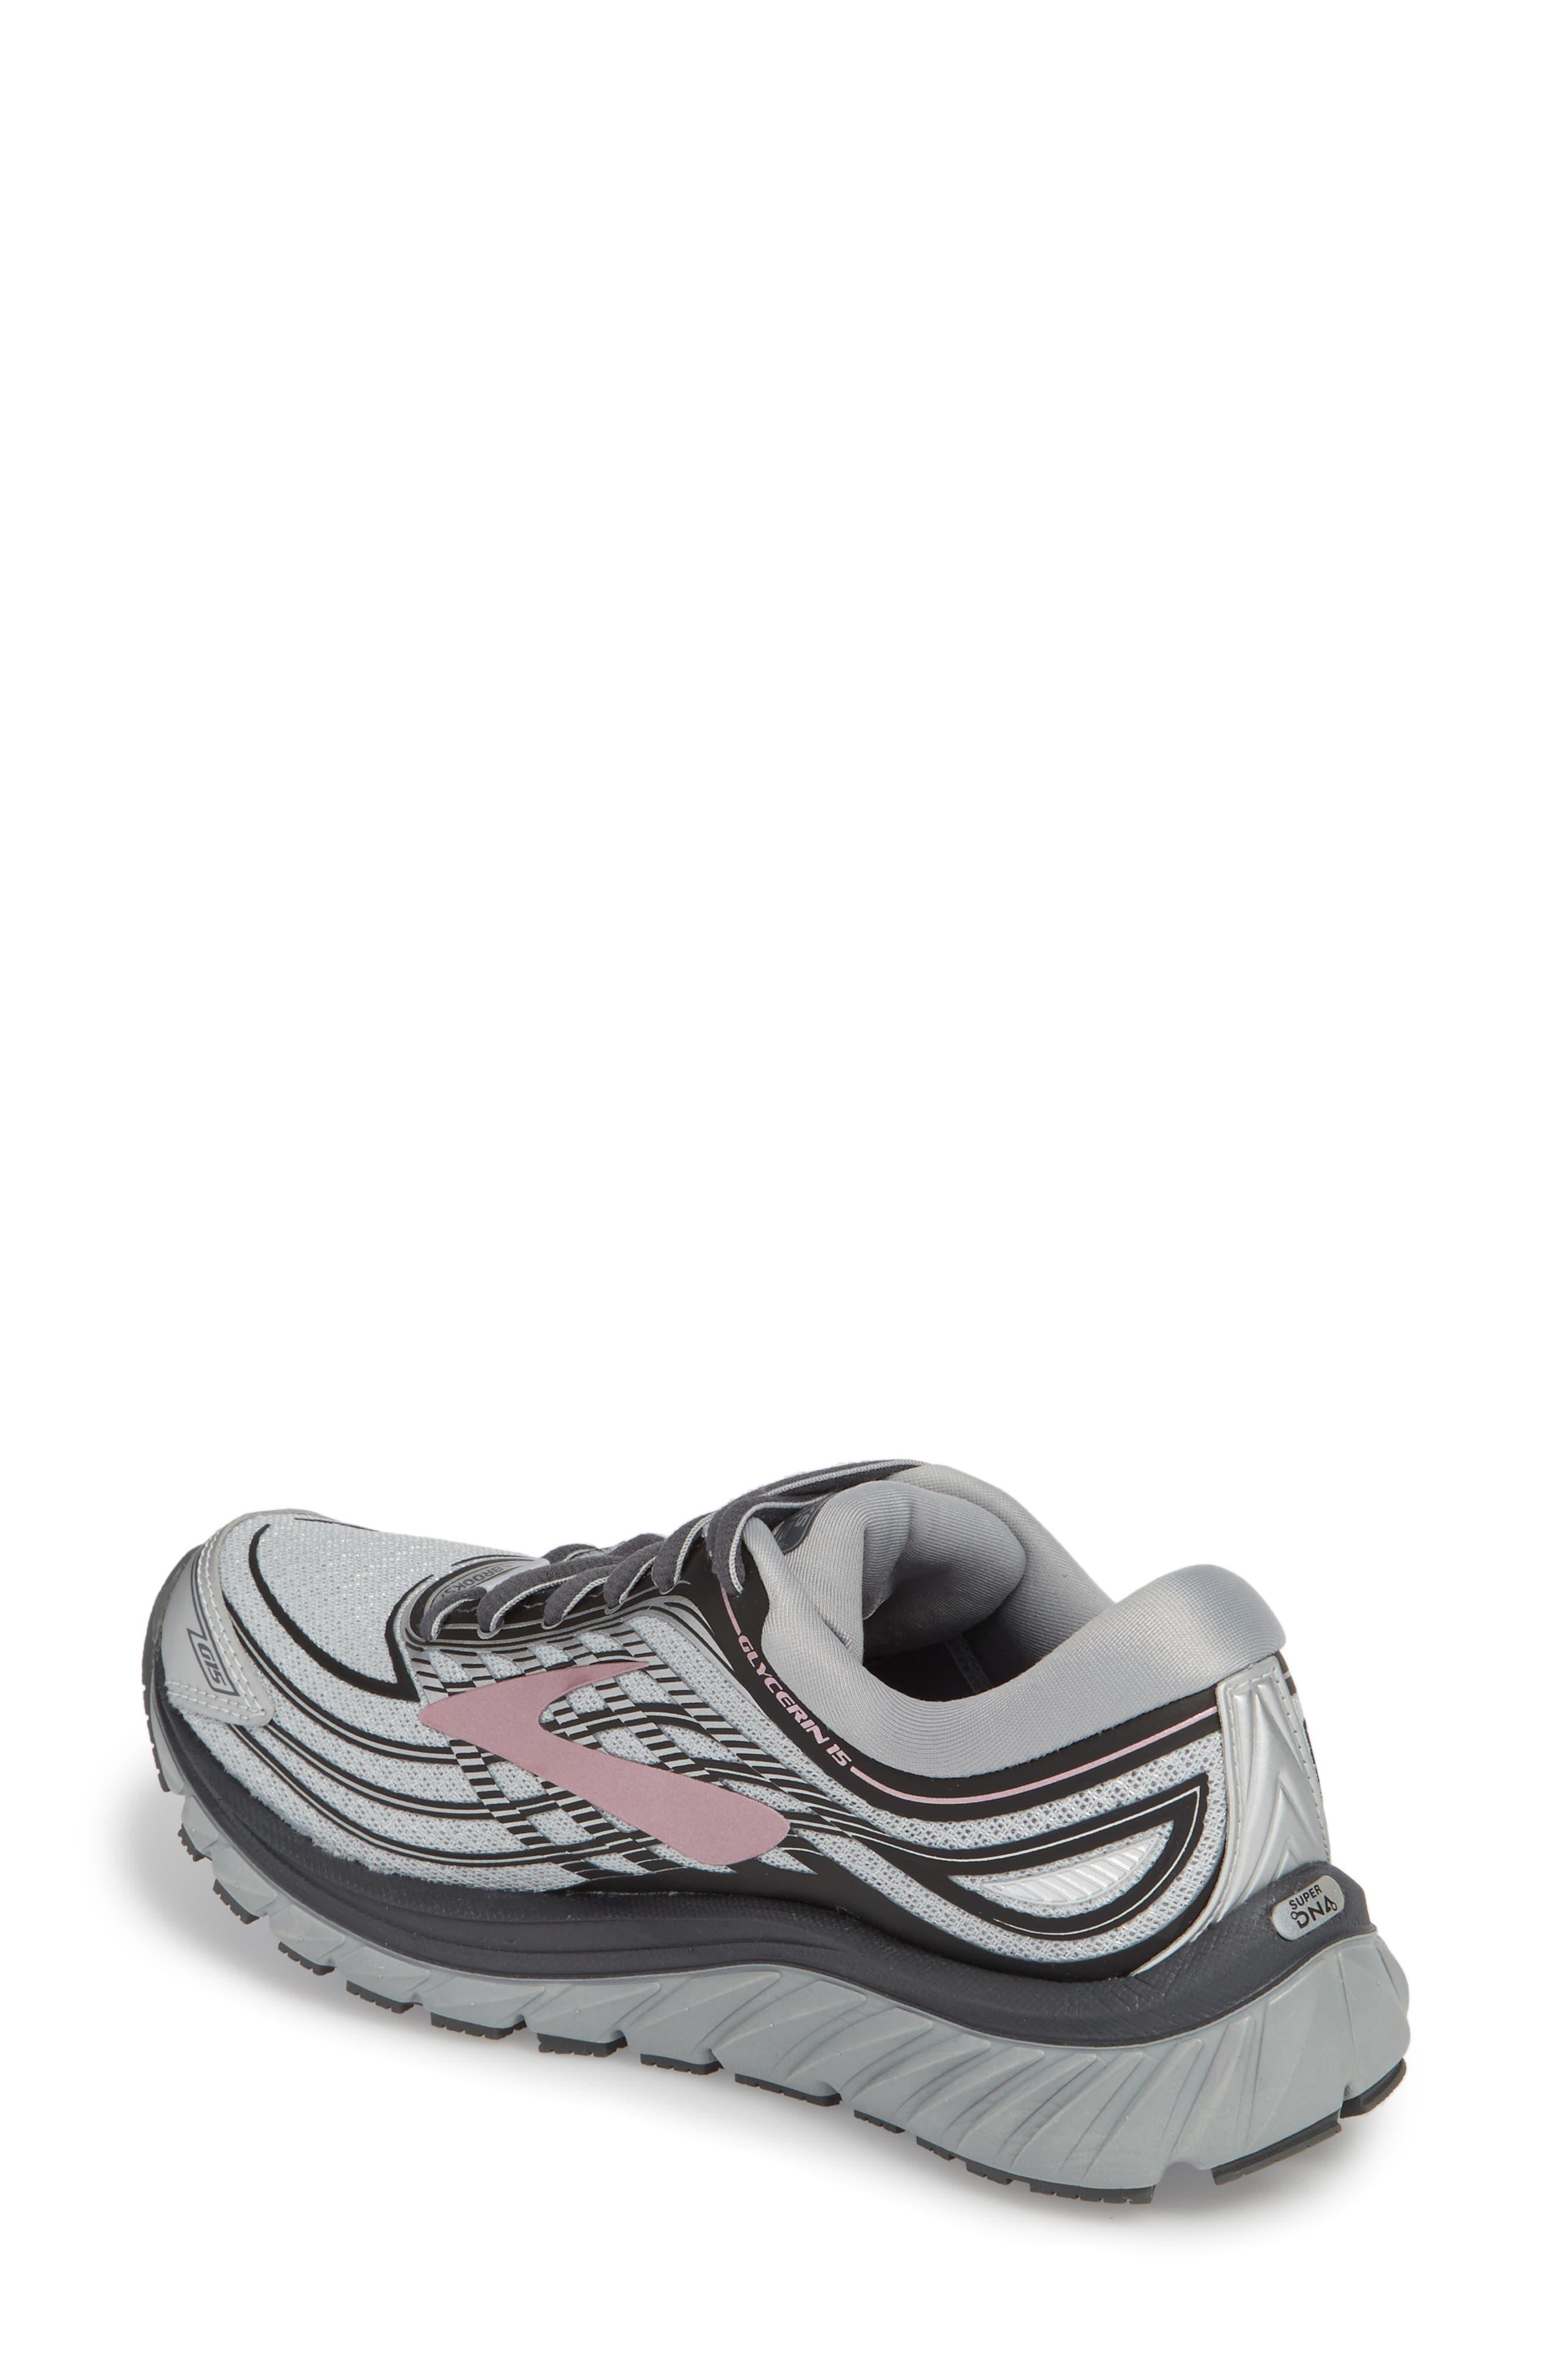 Glycerin 15 Running Shoe,                             Alternate thumbnail 2, color,                             057